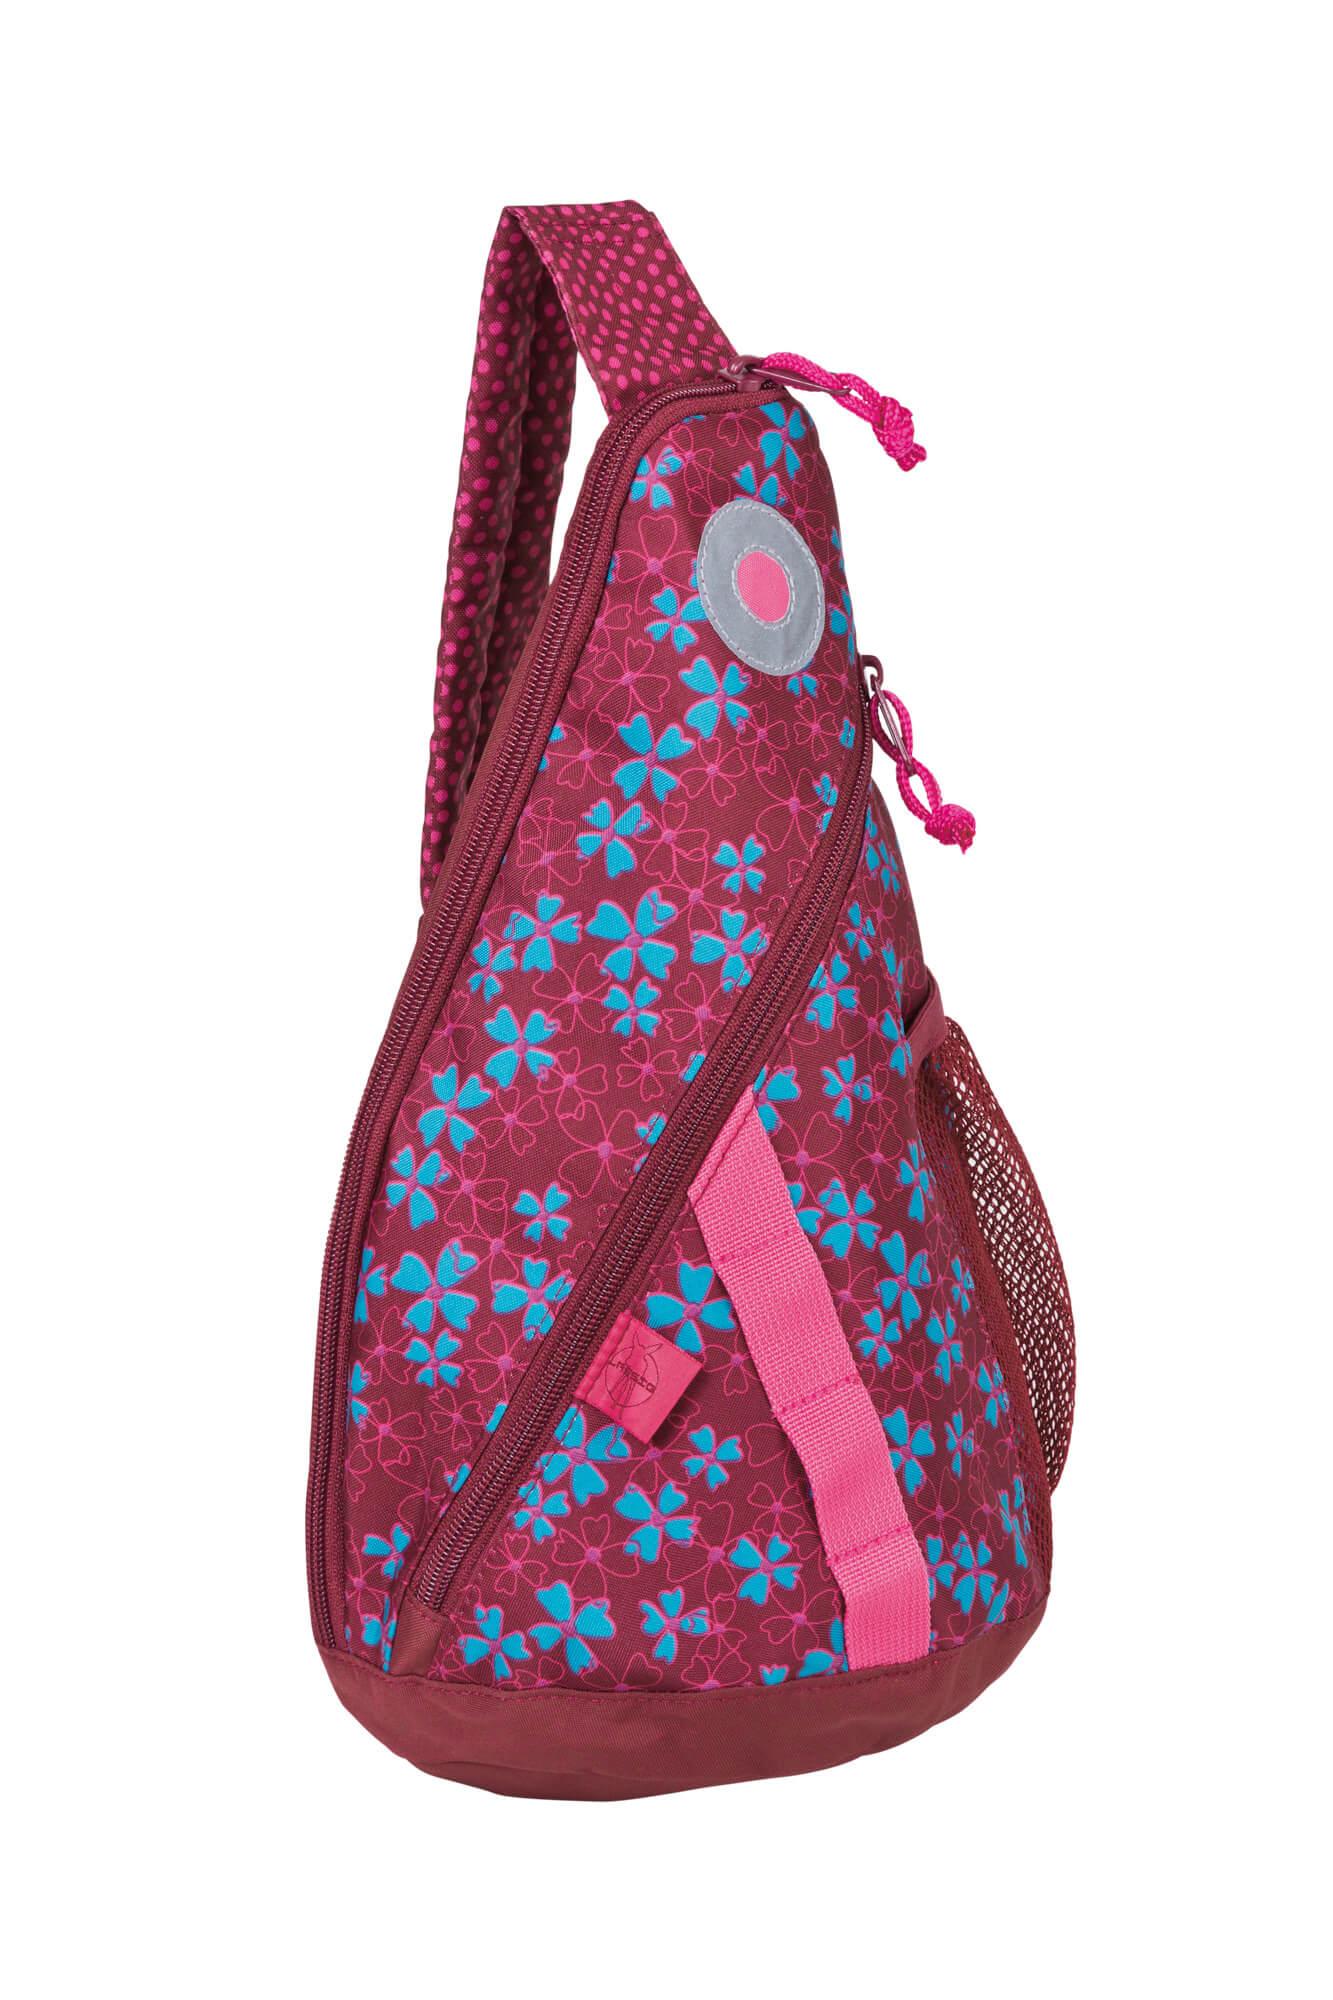 Rucksack mini sling bag blossy pink lÄssig fashion